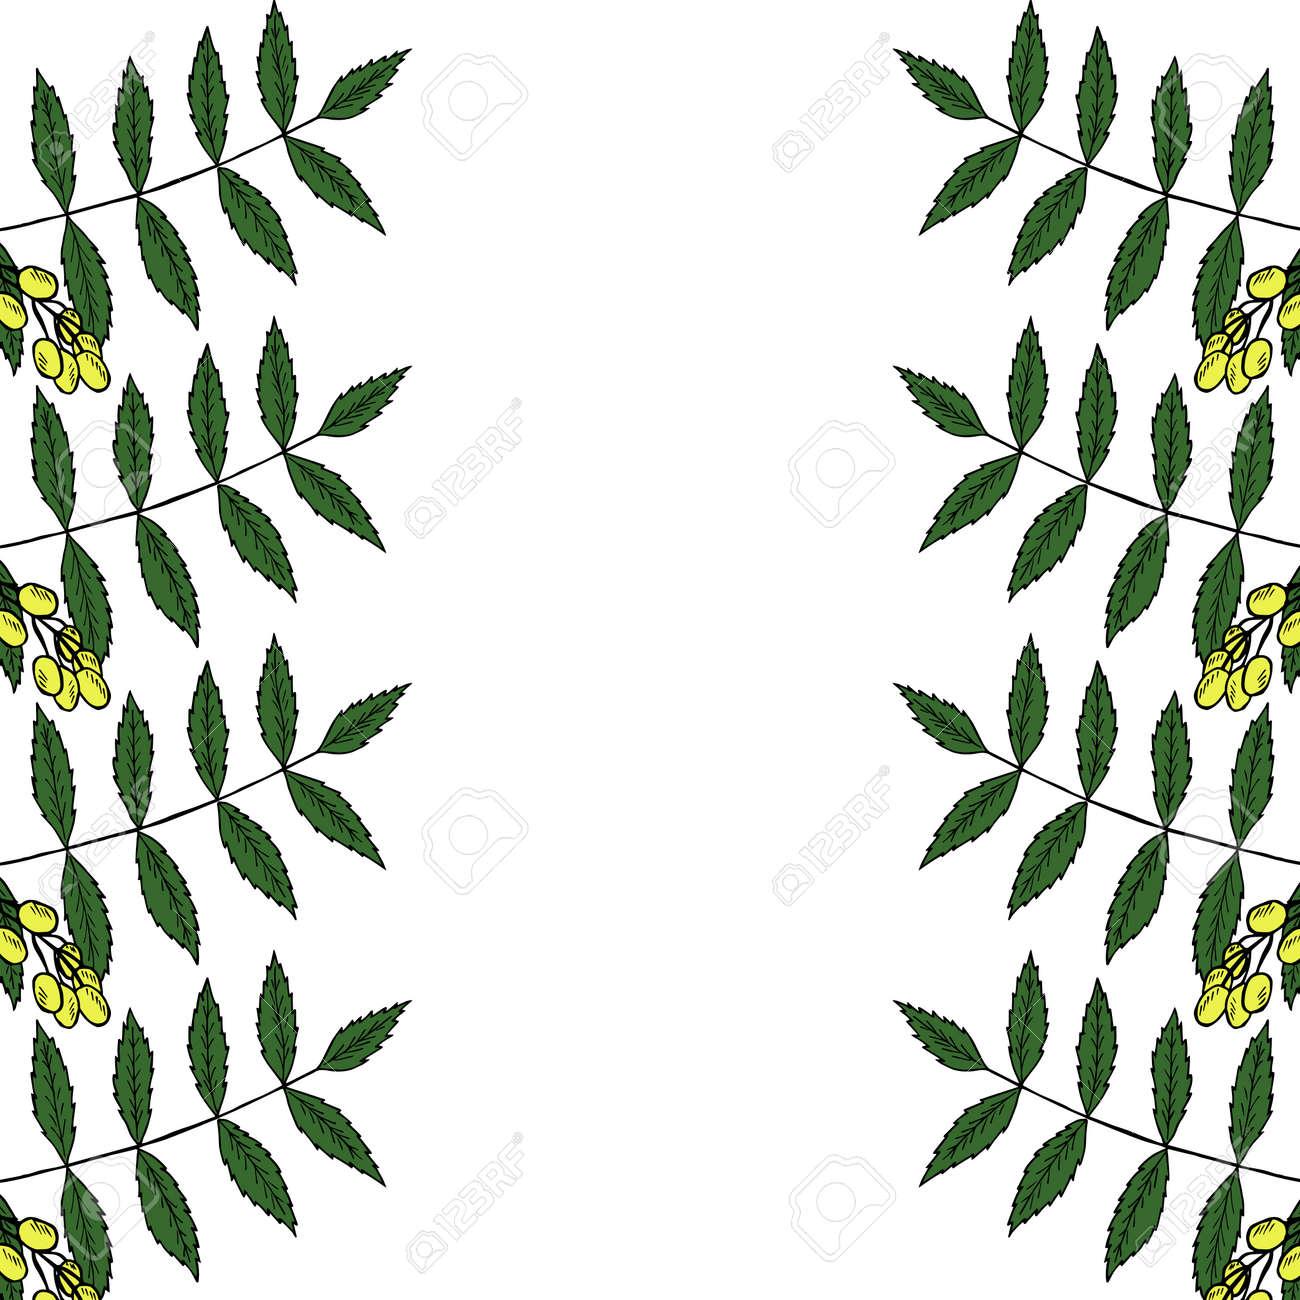 neem or nimtree medicinal plant frame border ayurvedic herb rh 123rf com free herb border clip art free herb border clip art